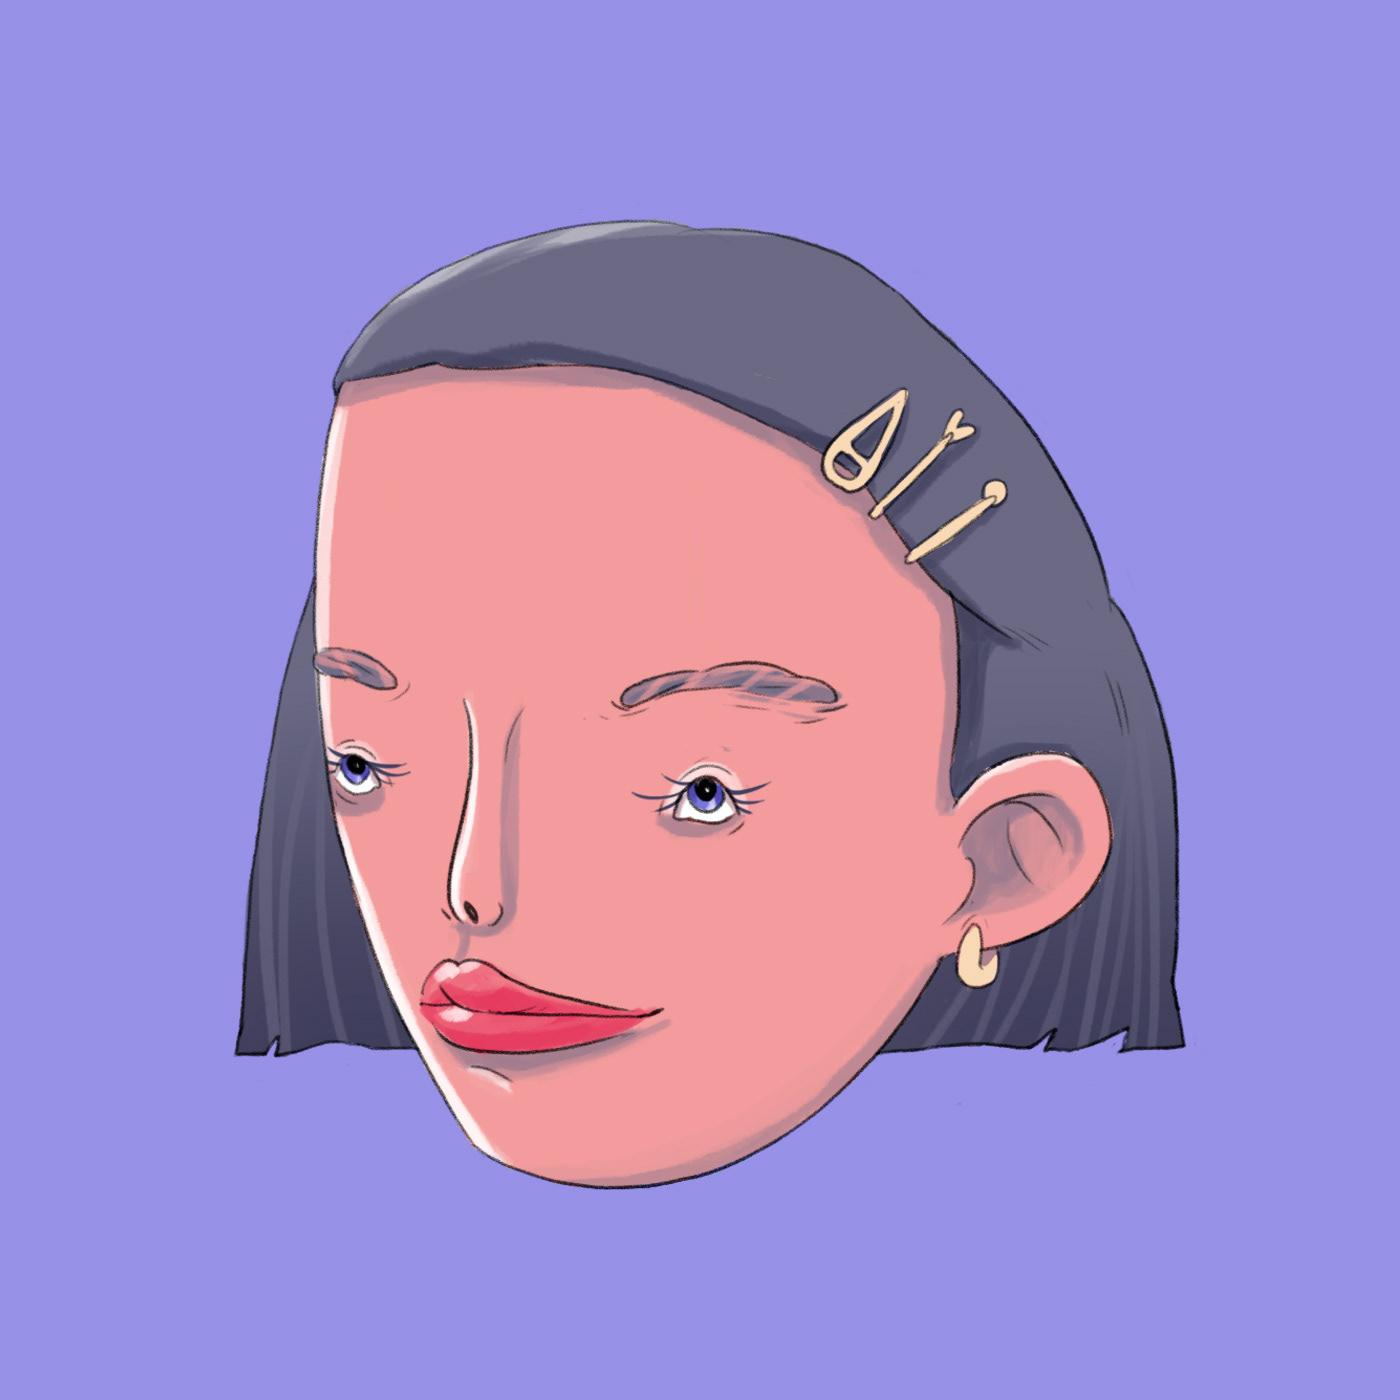 Image may contain: cartoon, sketch and human face